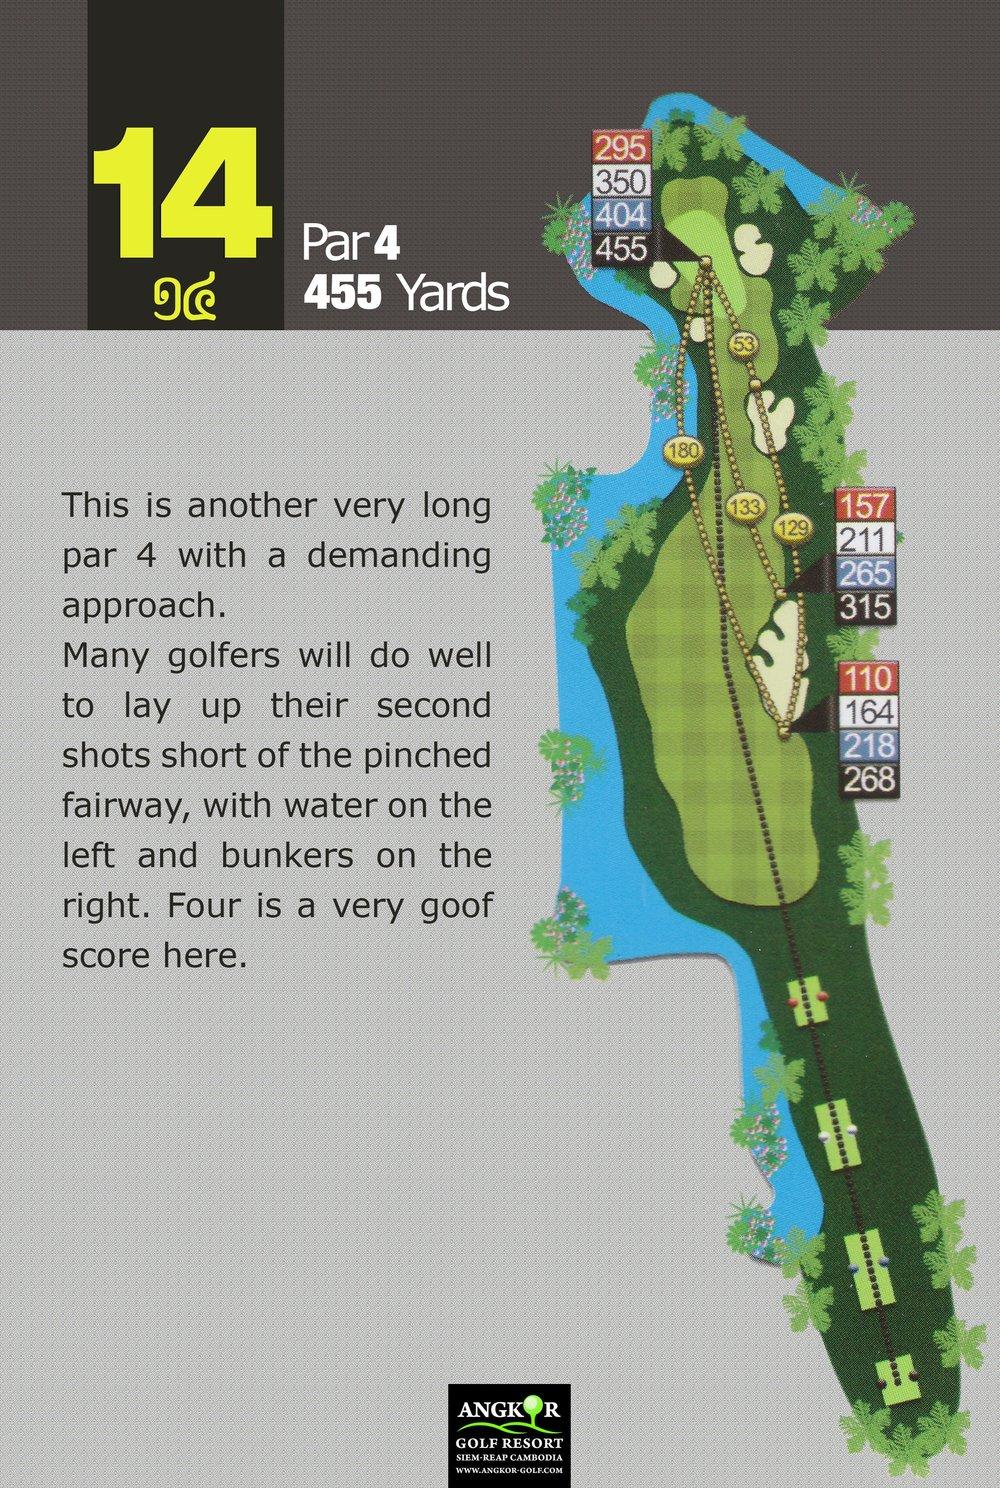 Hole 14 - Par 4 455 Yards